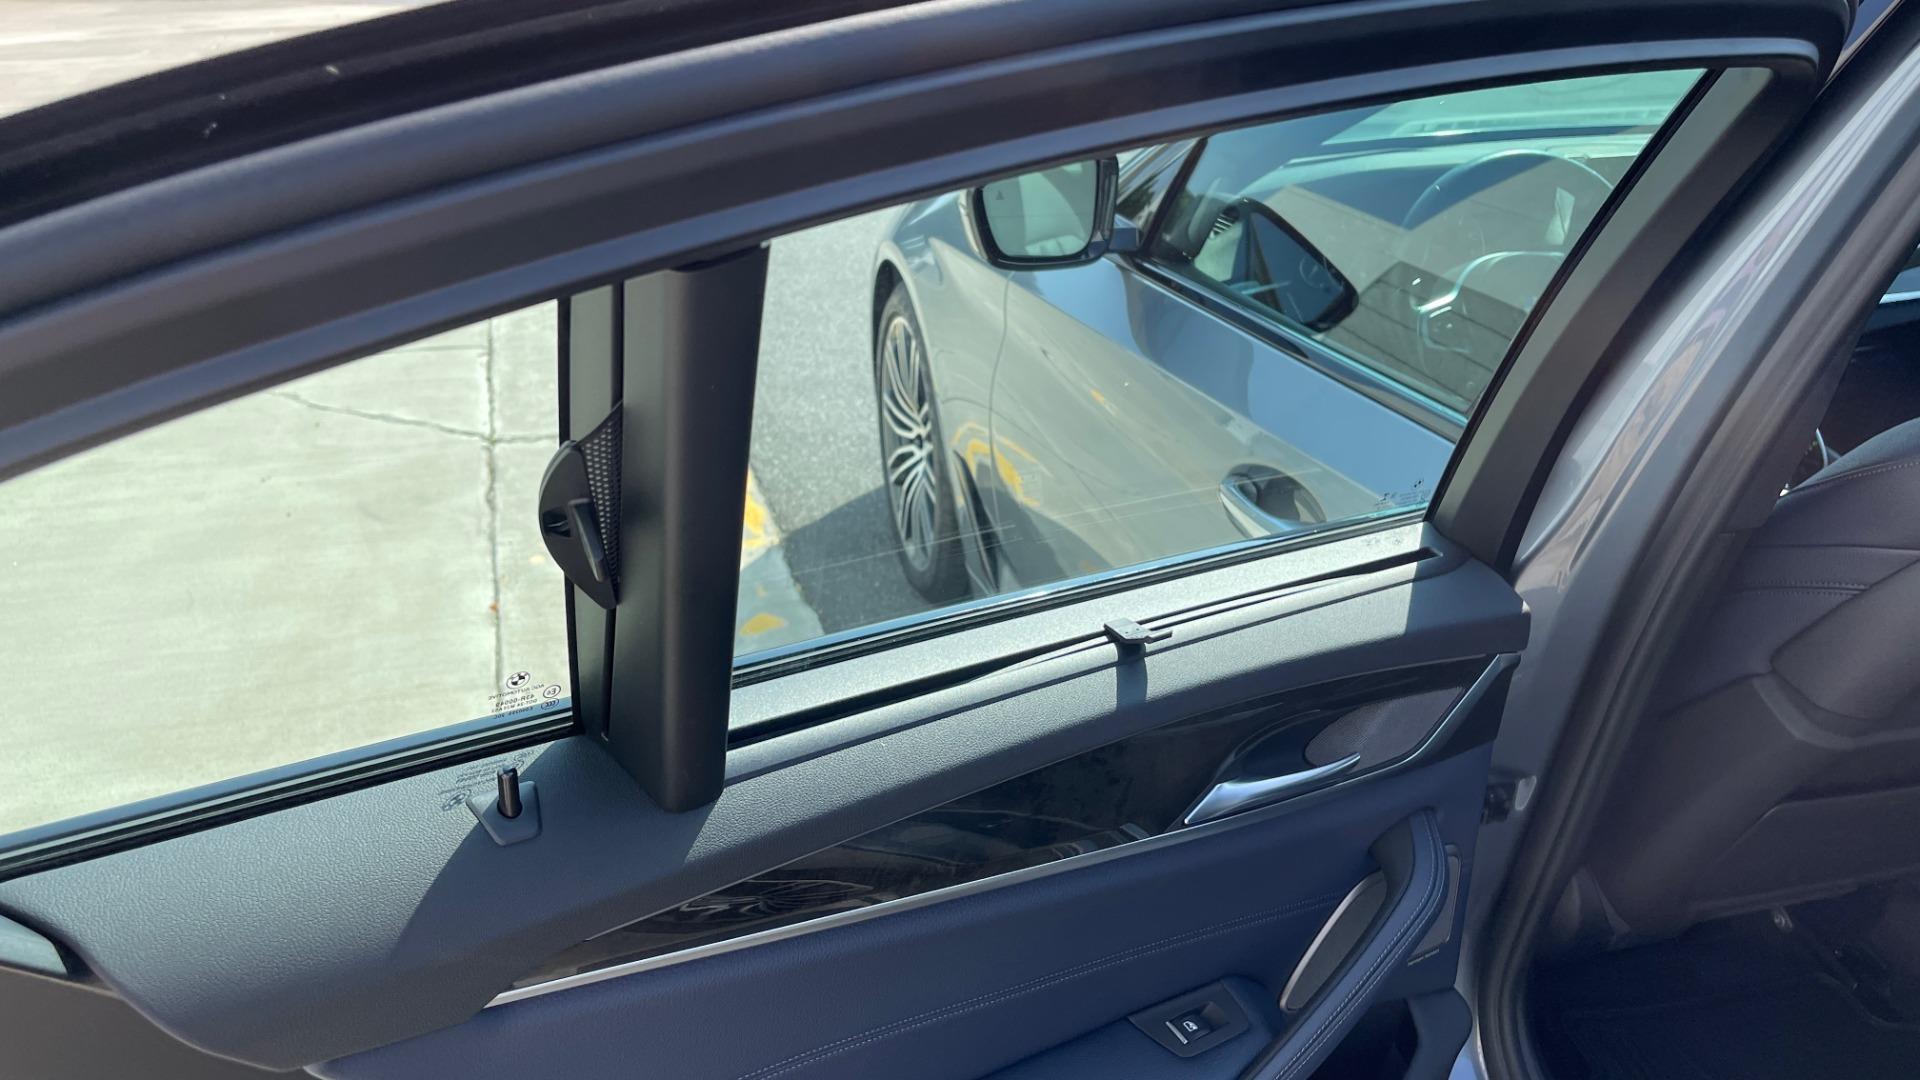 Used 2018 BMW 5 SERIES 540I XDRIVE M-SPORT / DRVR ASST / PDC / APPLE / HUD / H/K SND for sale $42,795 at Formula Imports in Charlotte NC 28227 53